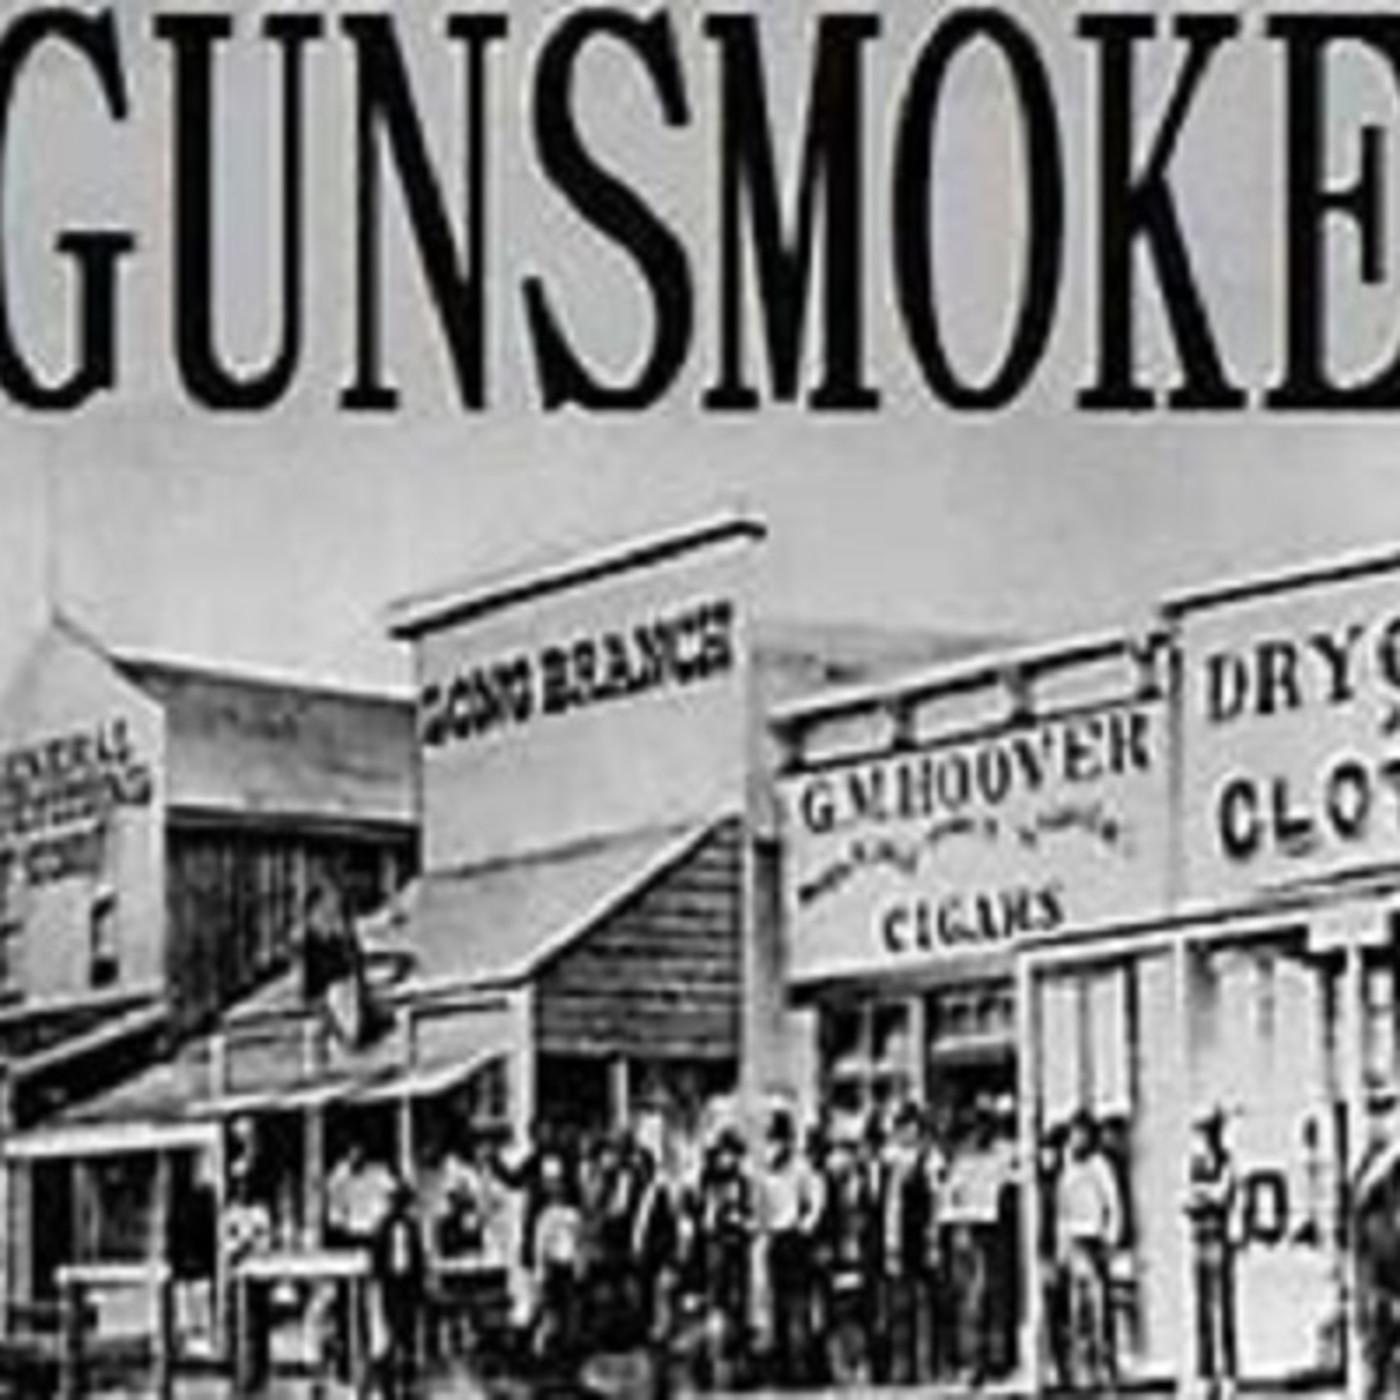 Gunsmoke 61-05-07 (474) Ma's Justice